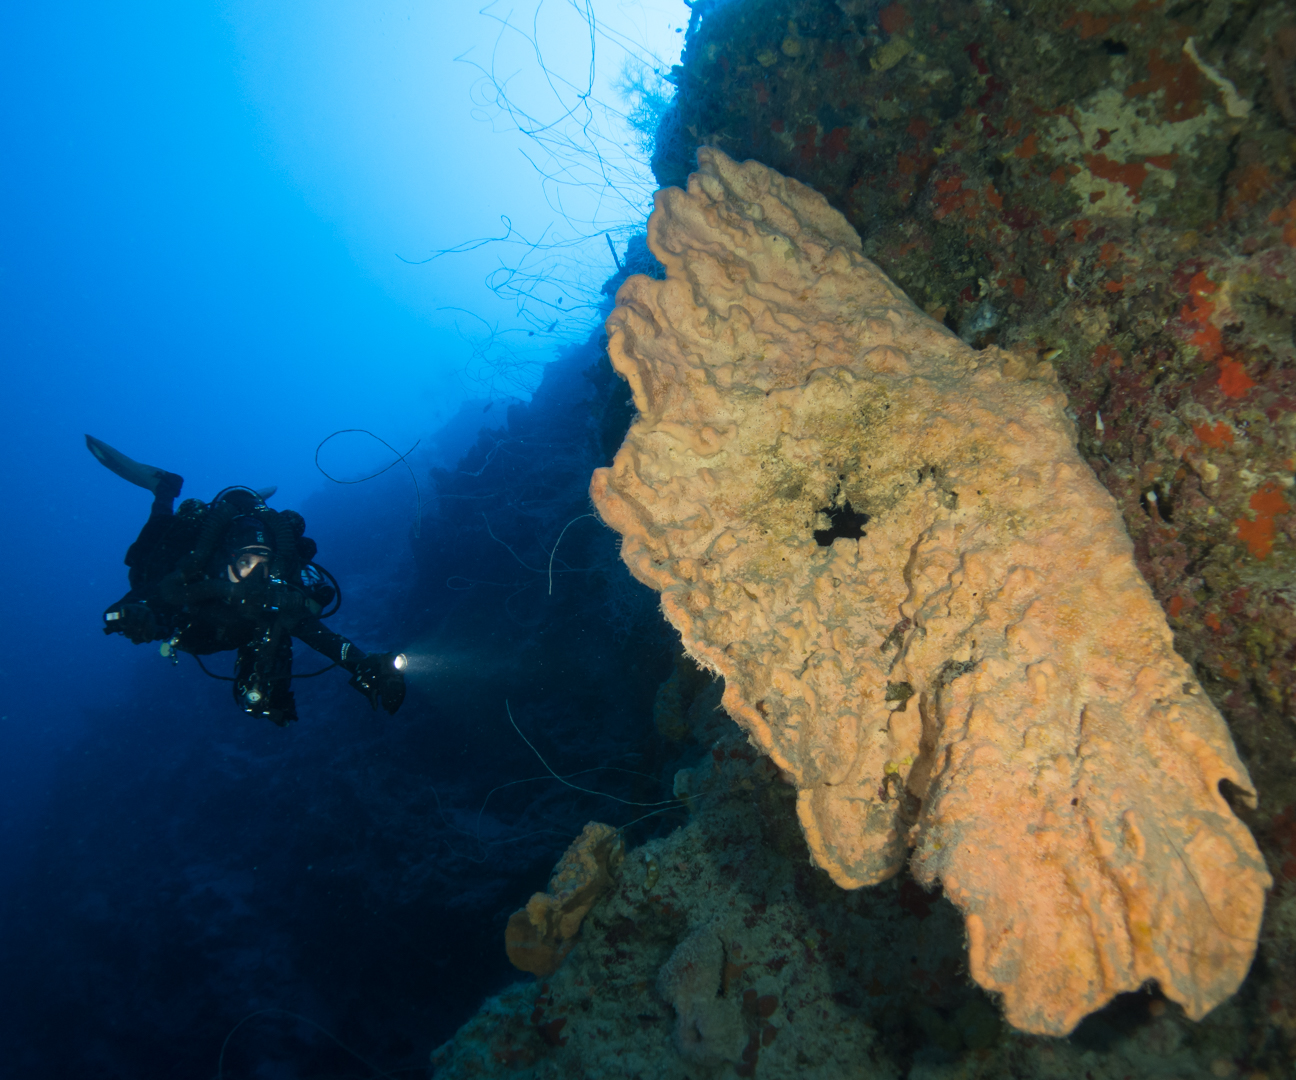 Rebreather St. Croix